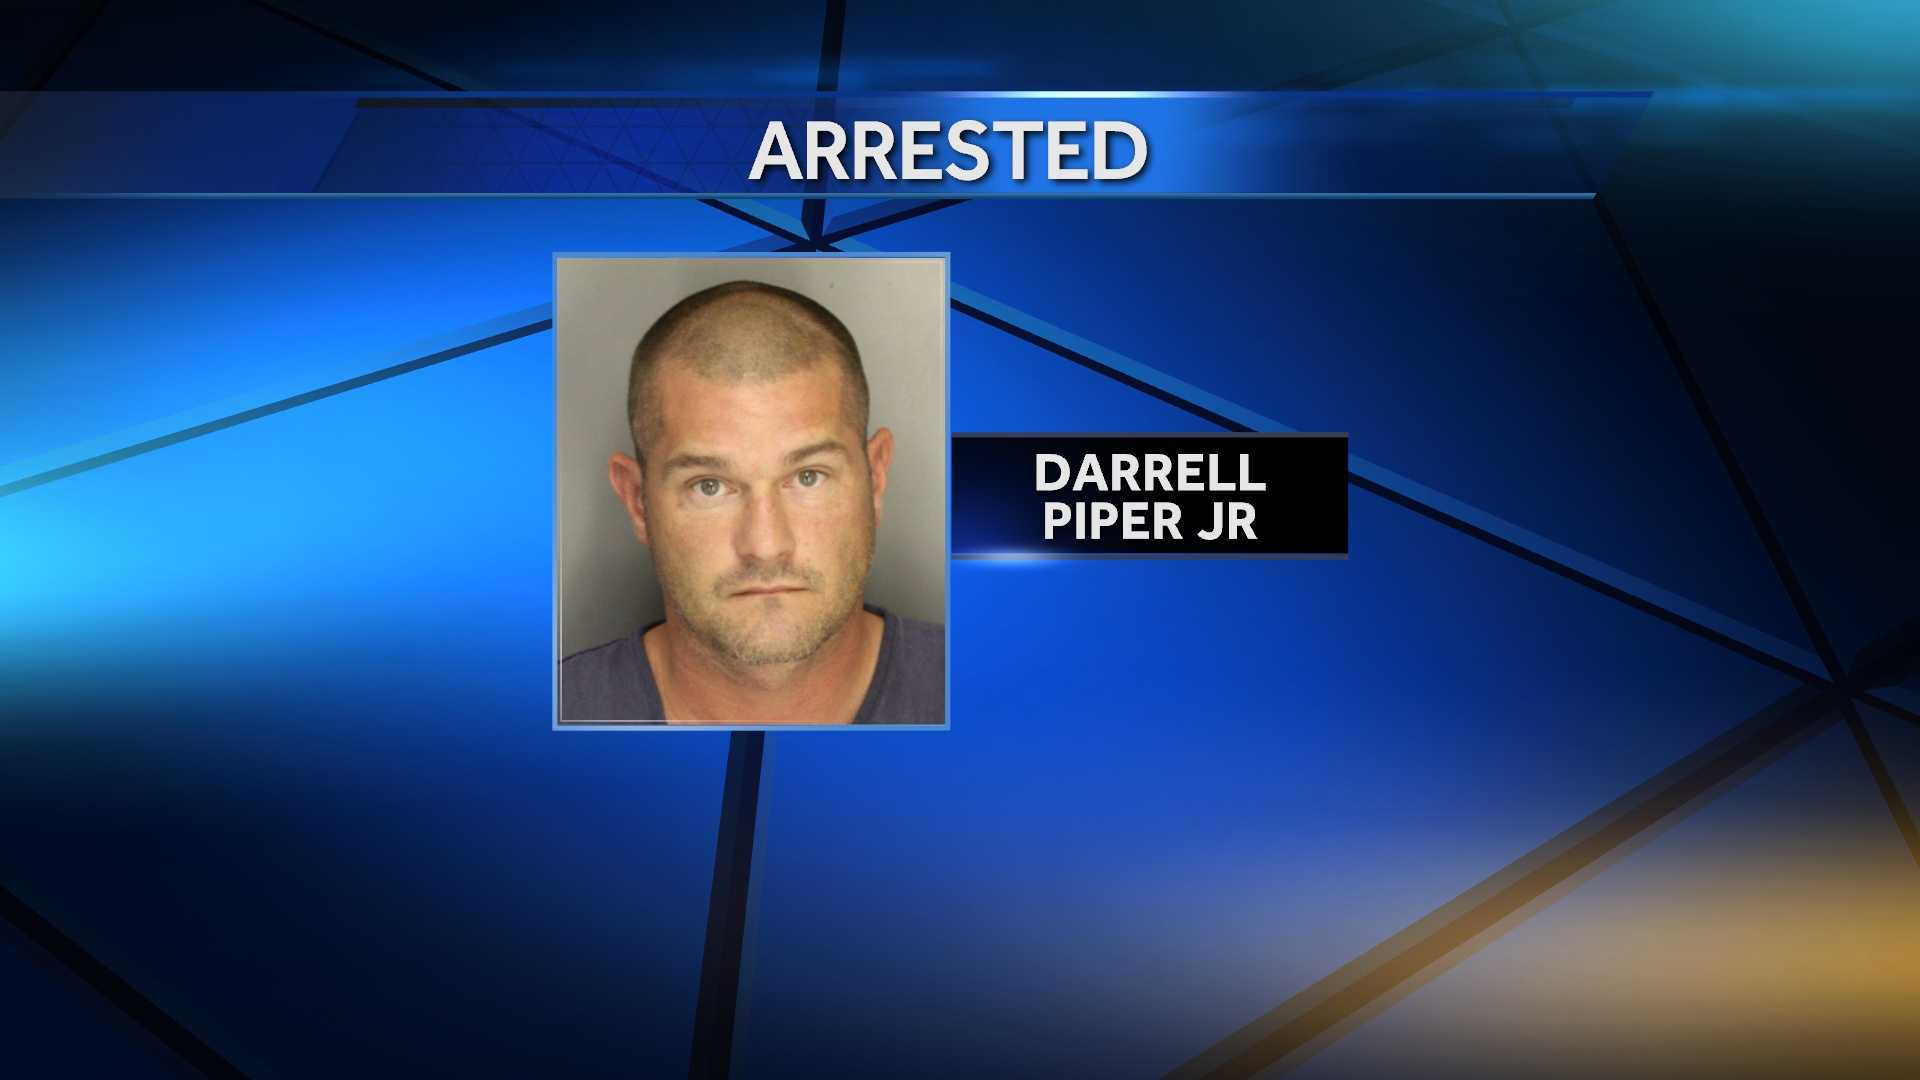 img- Darrell Piper Jr.